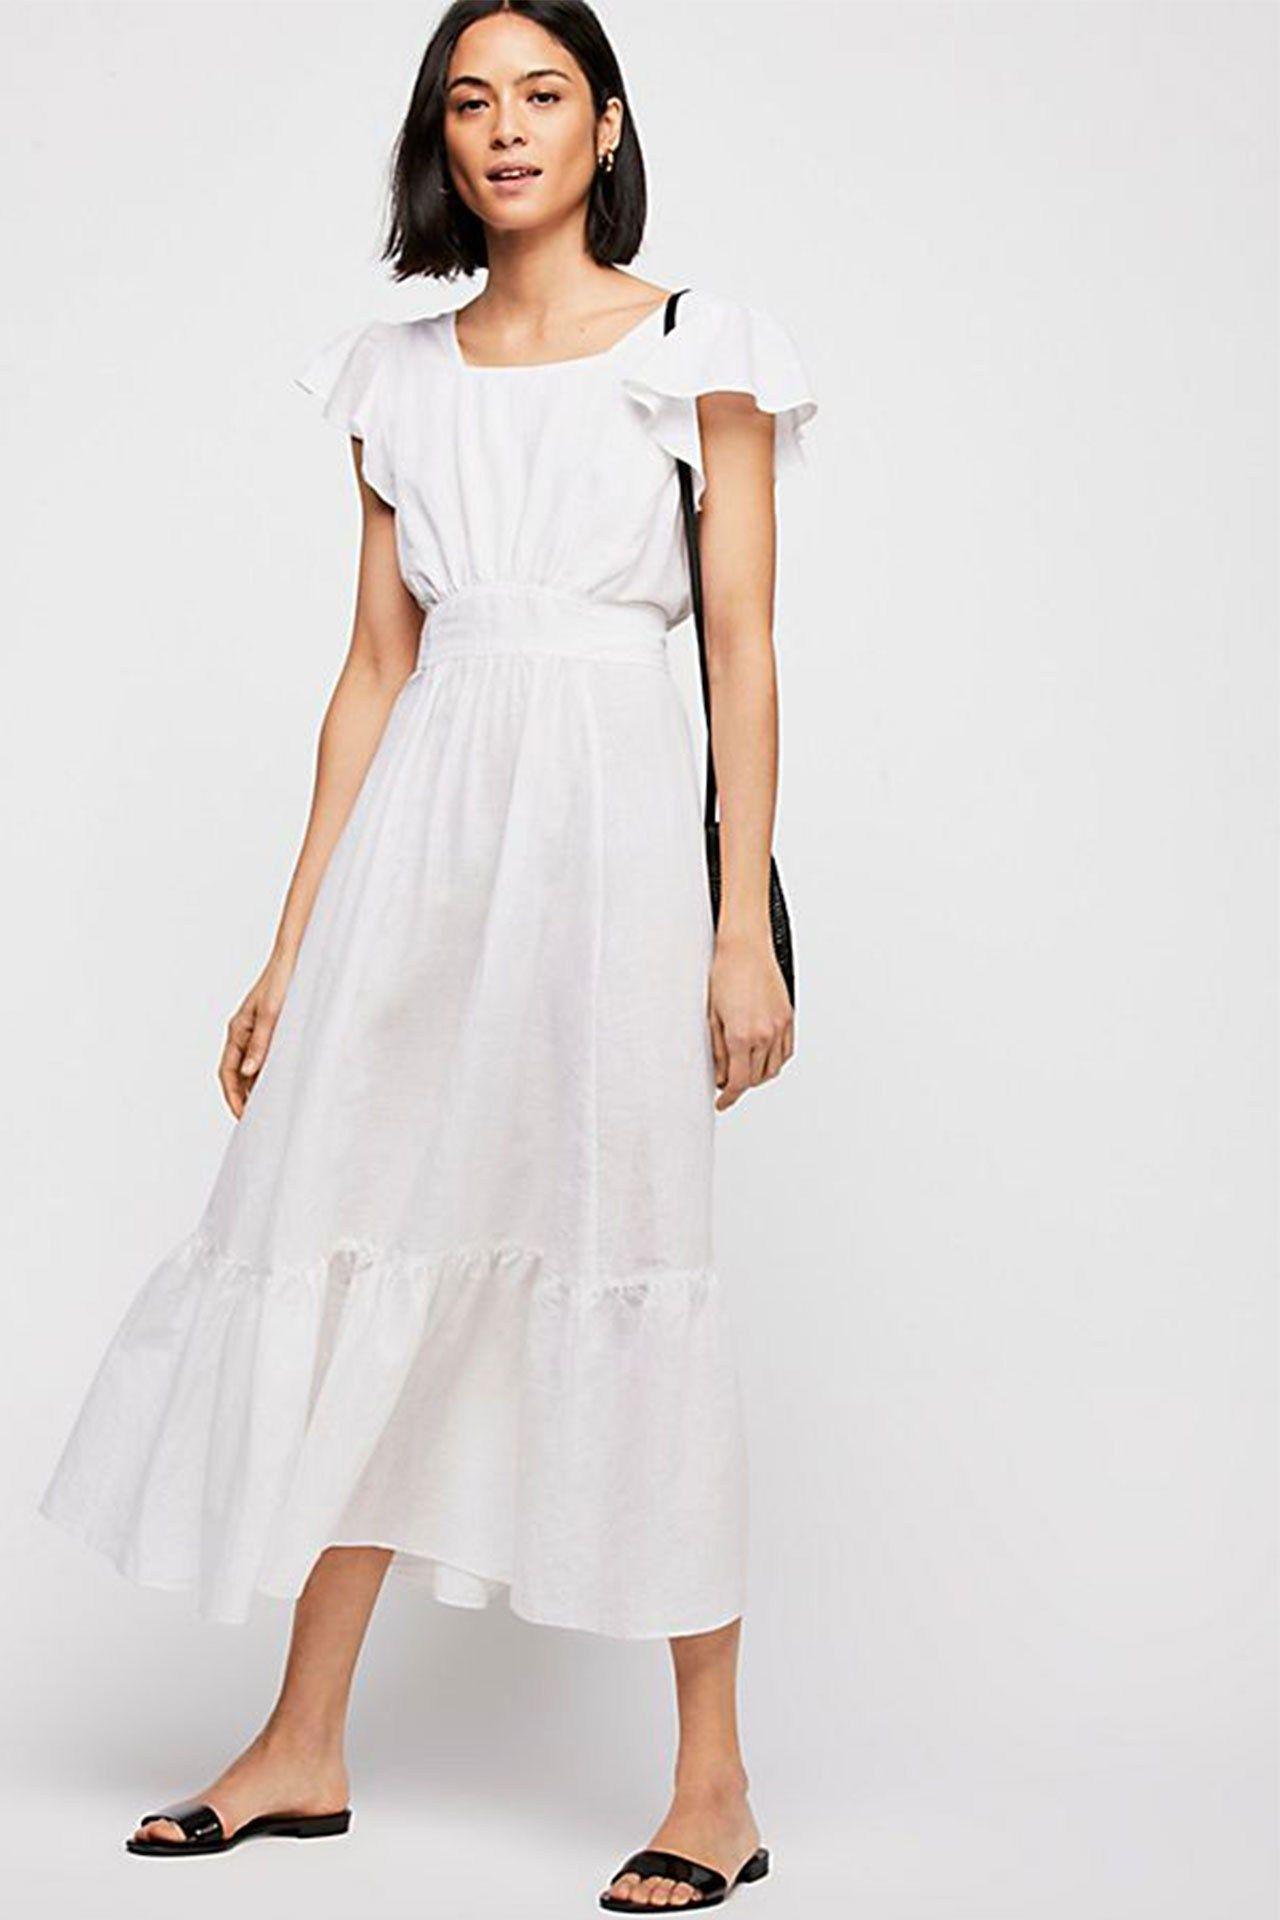 36 Beautiful Wedding Dresses For A Registry Do | Wedding dress ...